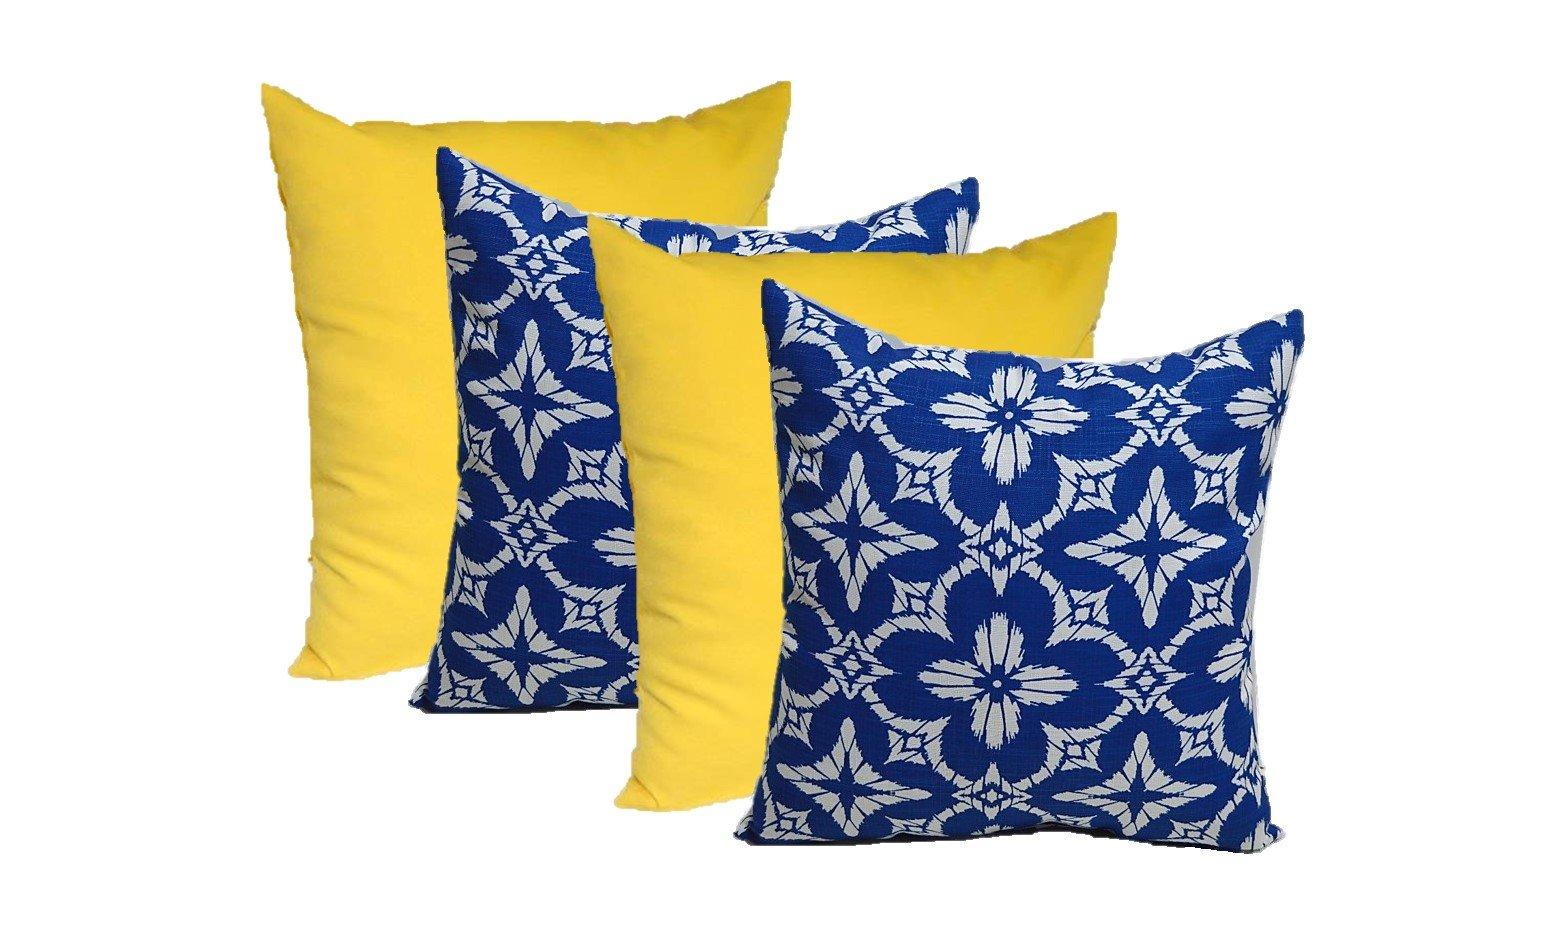 Set of 4 - Indoor / Outdoor 17'' Square Decorative Throw / Toss Pillows - 2 Solid Yellow & 2 Richloom Aspidoras Cobalt - Royal Blue / White Geometric Sunburst